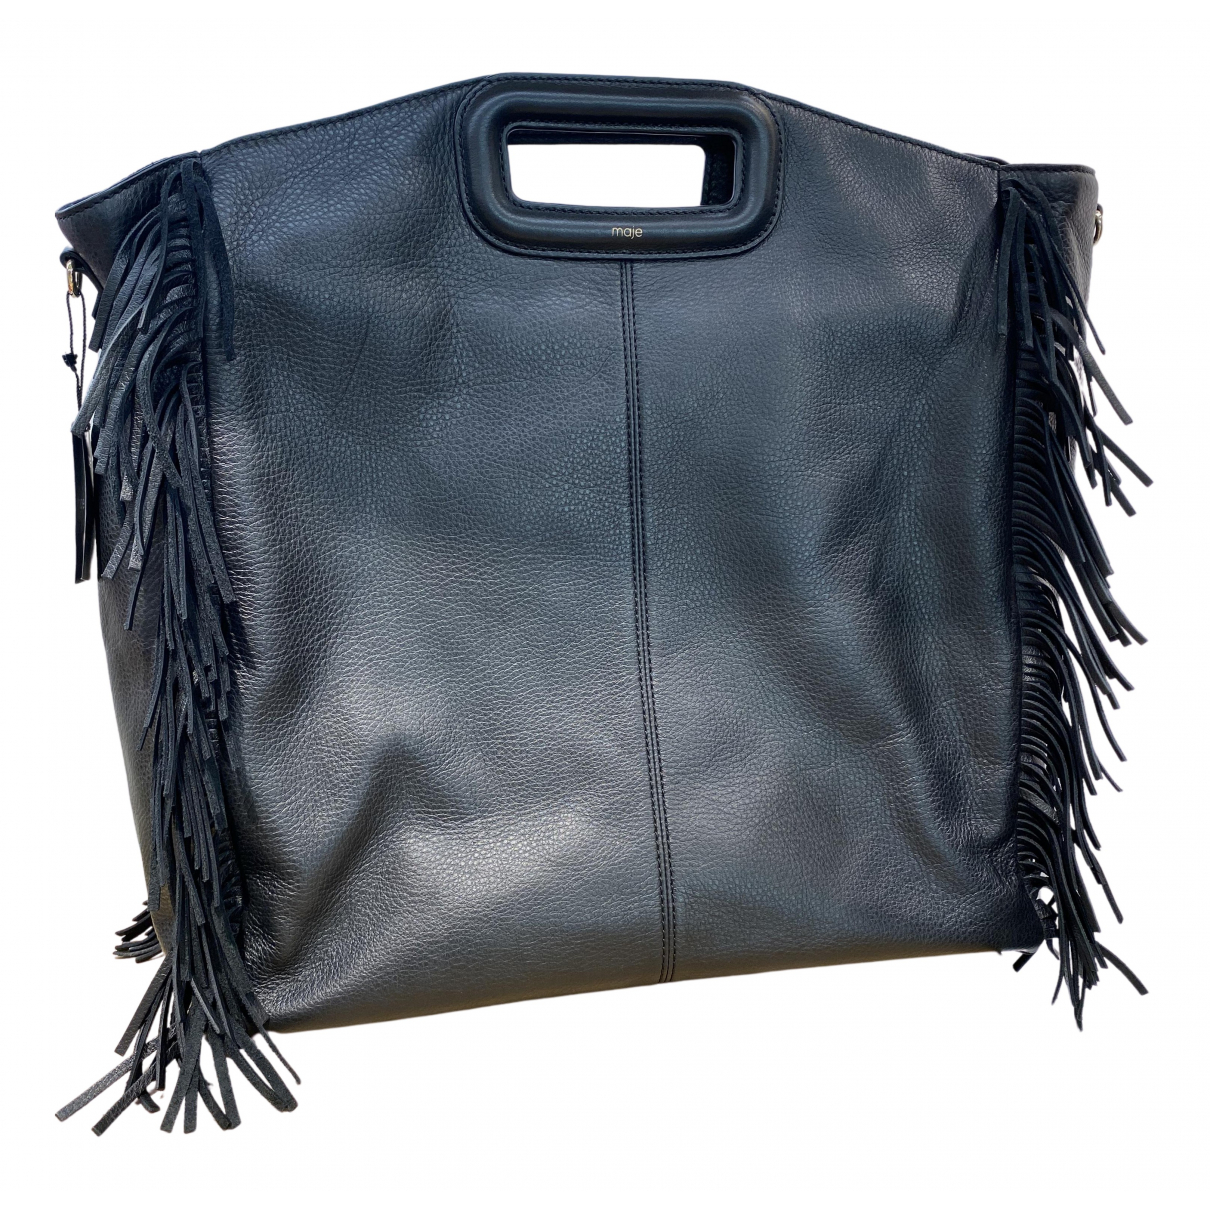 Maje Sac M Black Leather handbag for Women N